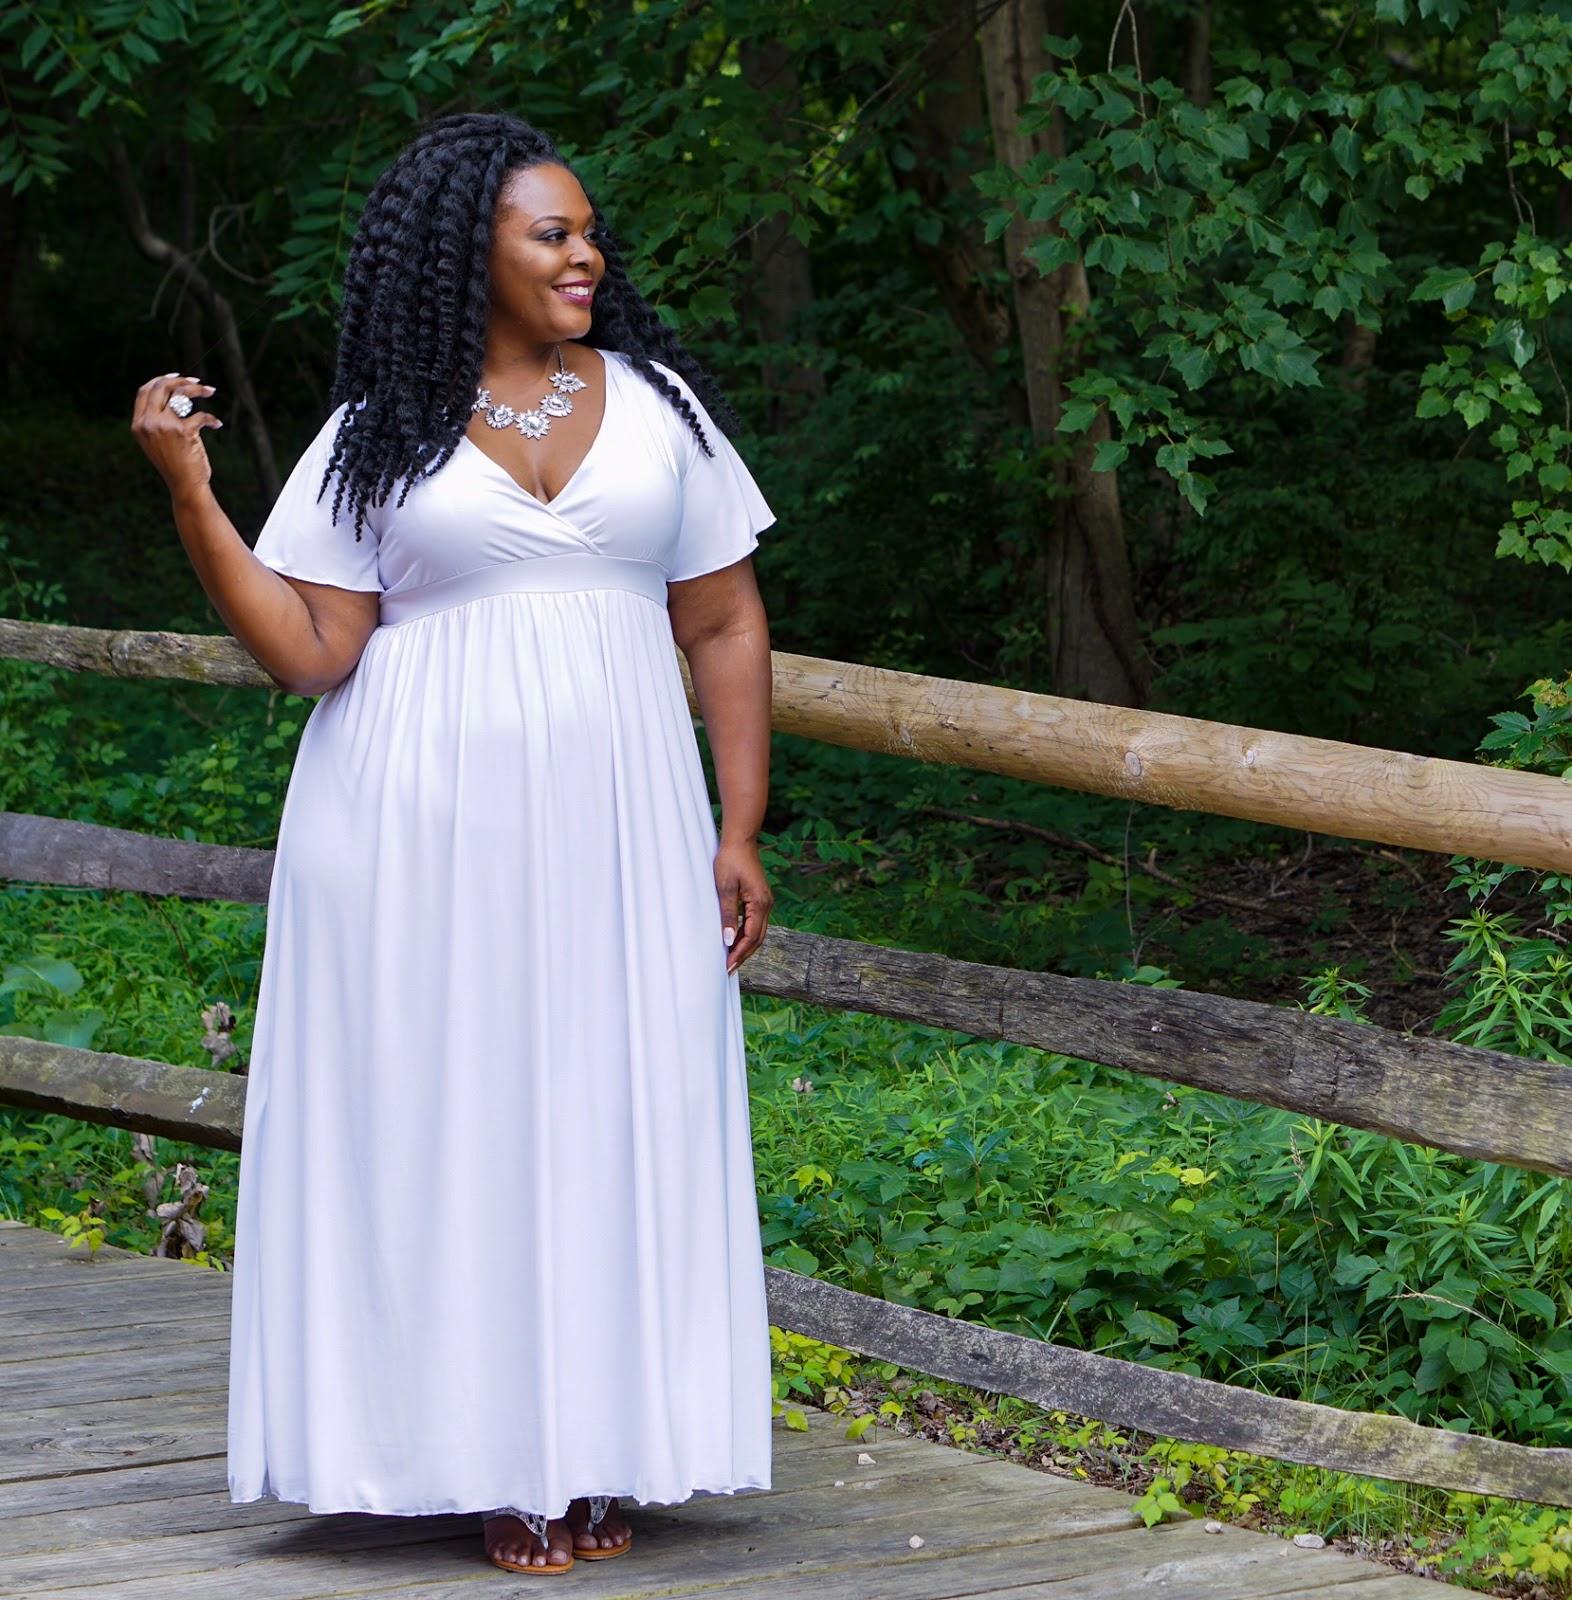 swak maxi dress, swak designs maxi dress, white plus size dress, white maxidress, white plus size maxidress